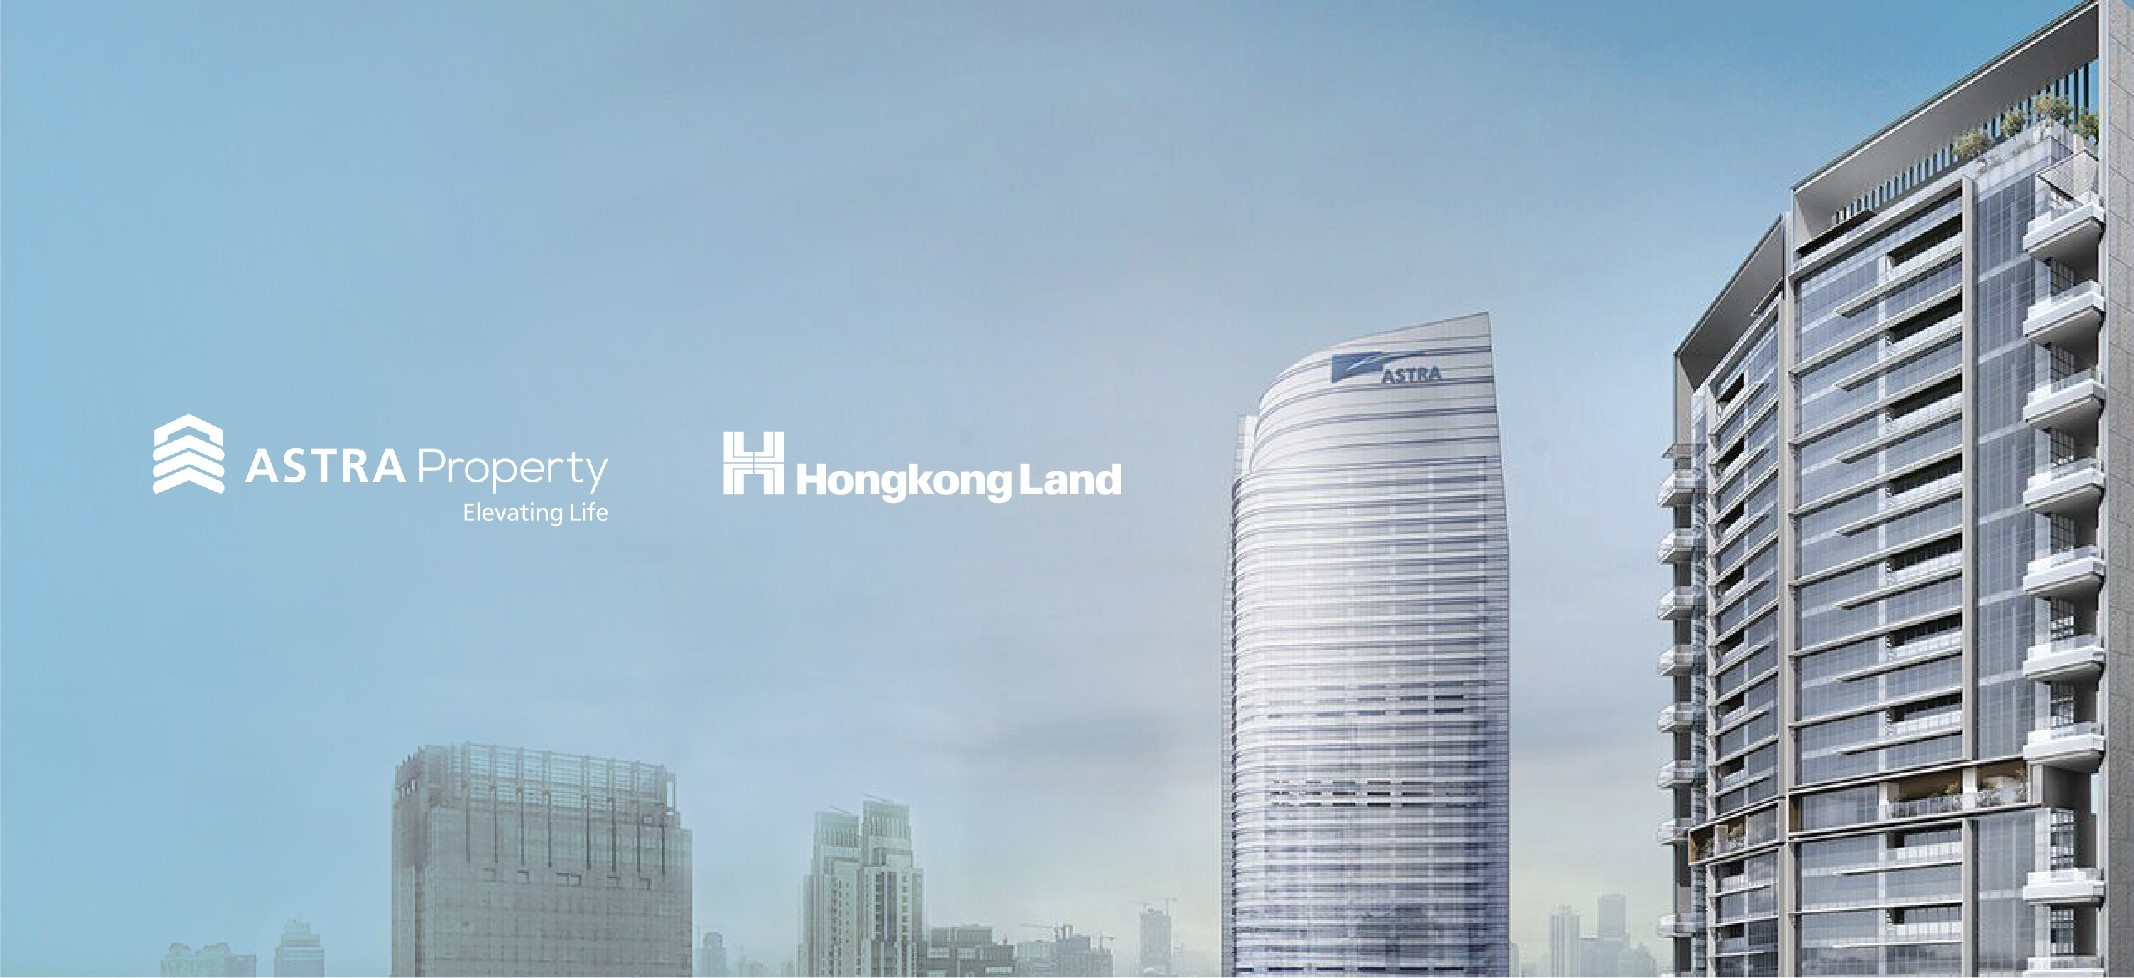 PT Astra Land Indonesia | LinkedIn